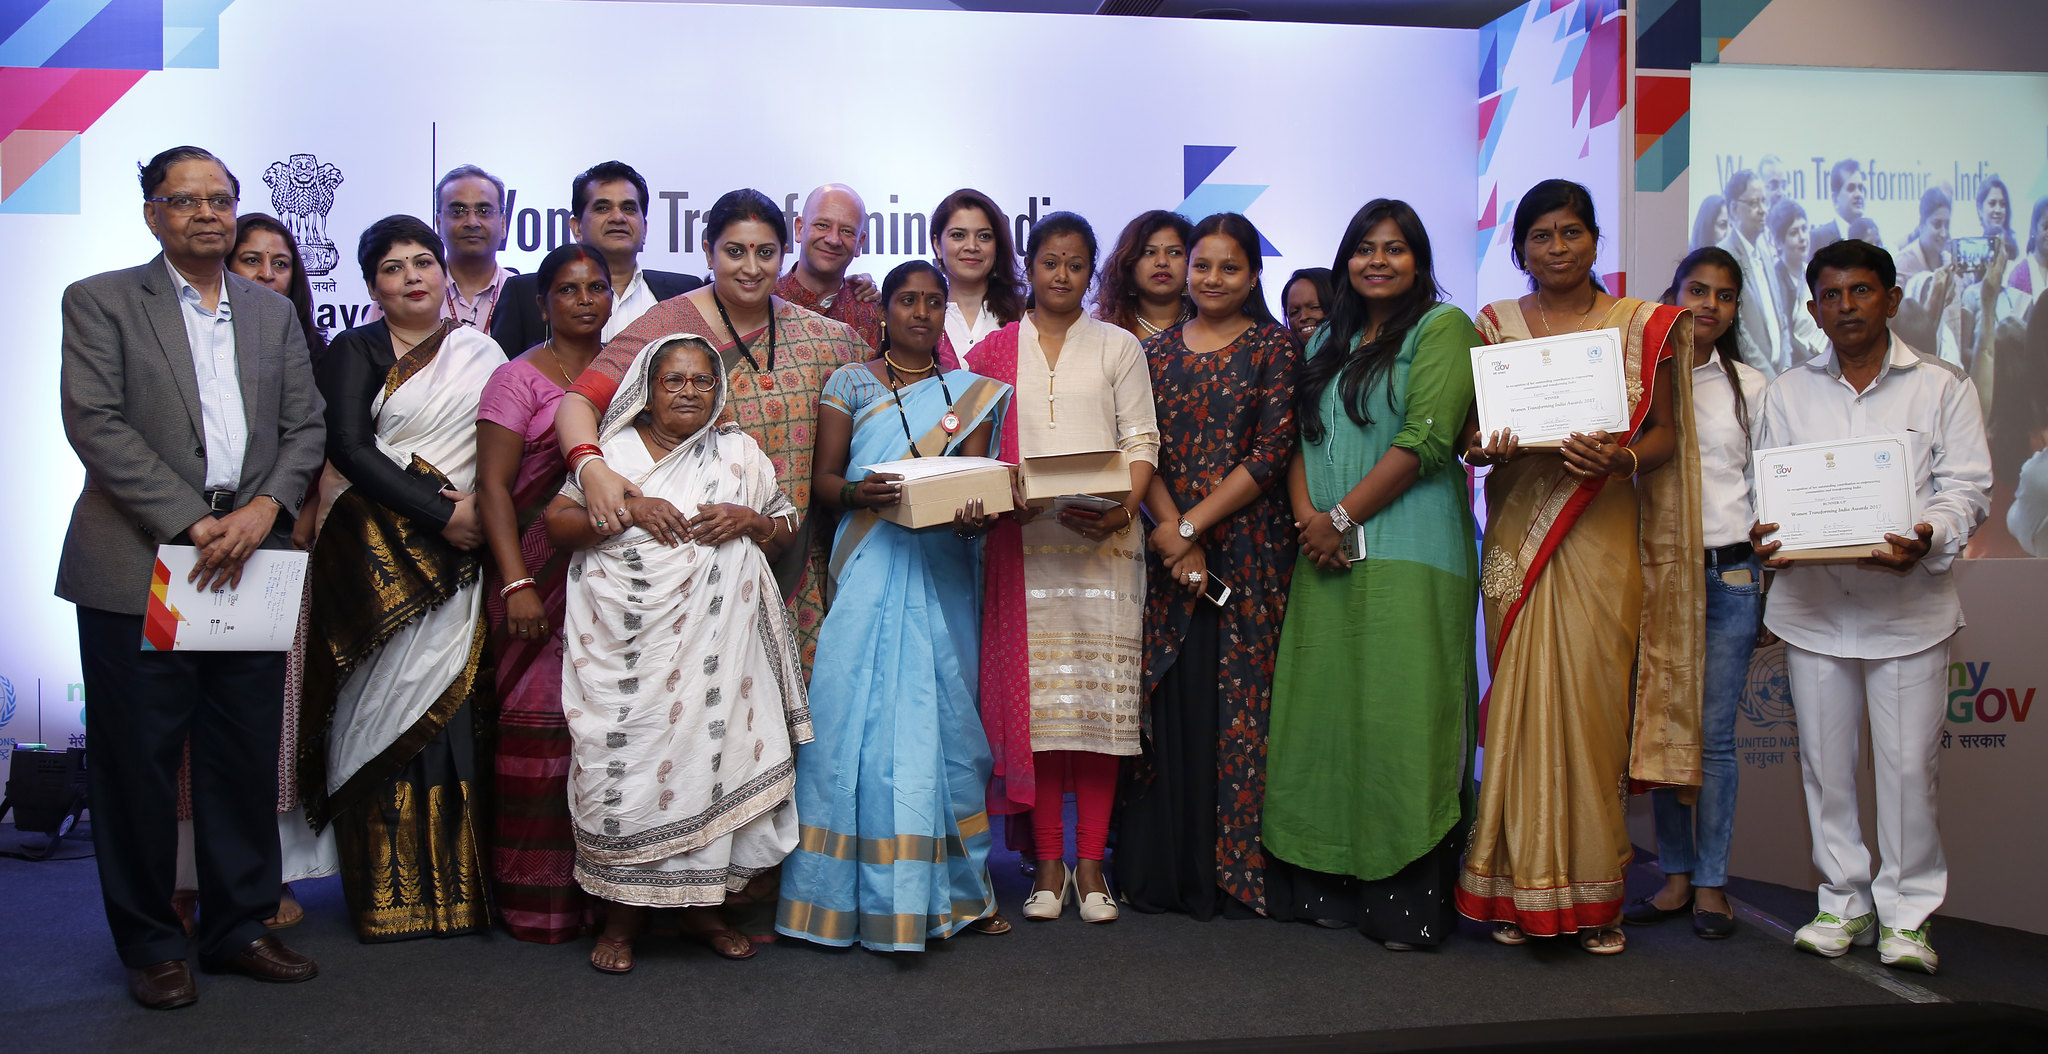 Women Transforming India 2017